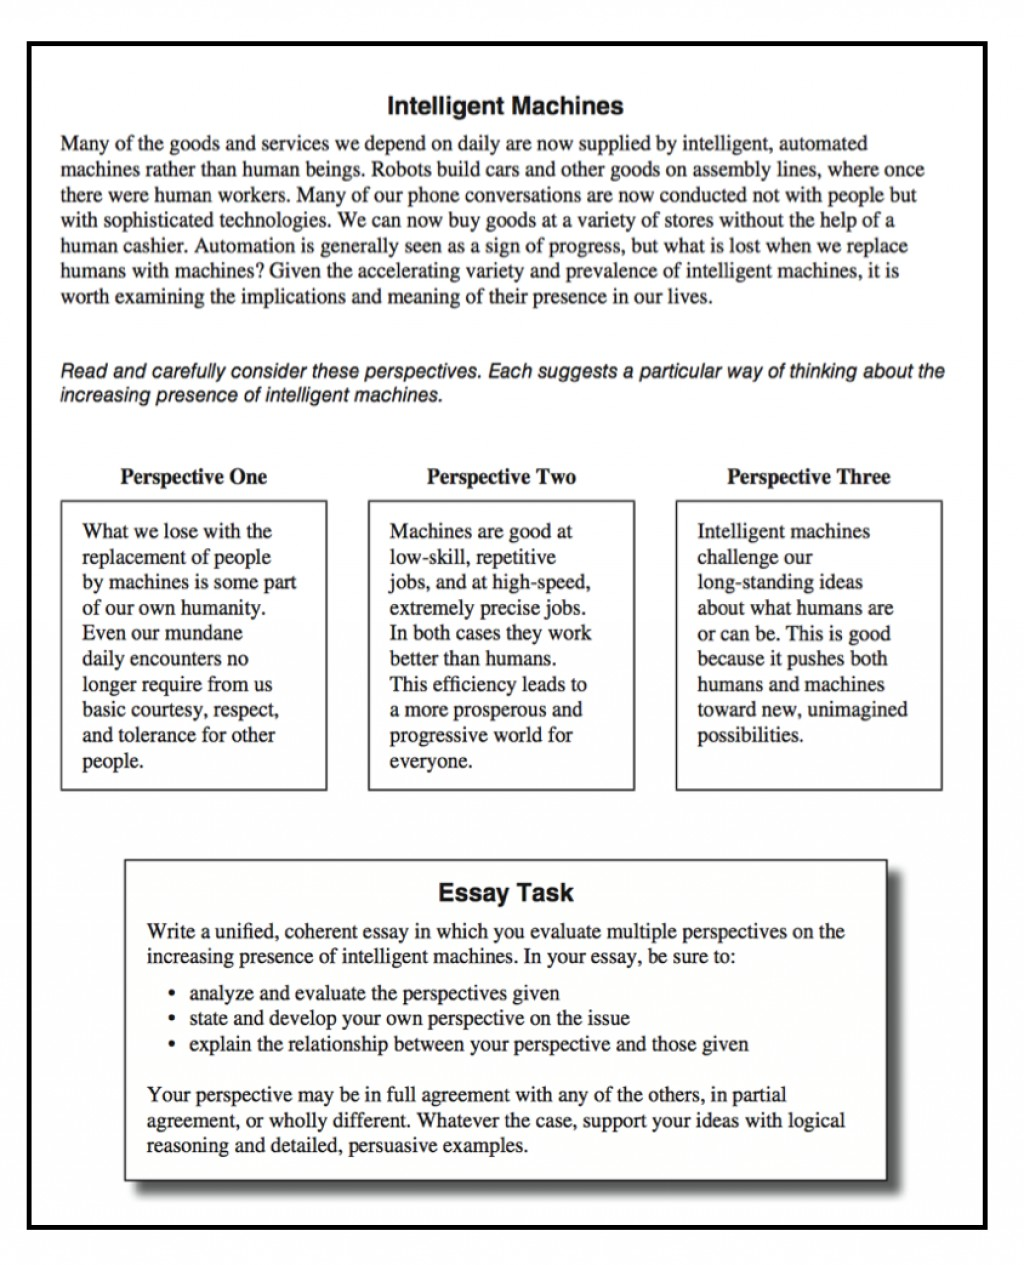 003 Act Essay Tips Example Screen Shot At Incredible Prepscholar Large